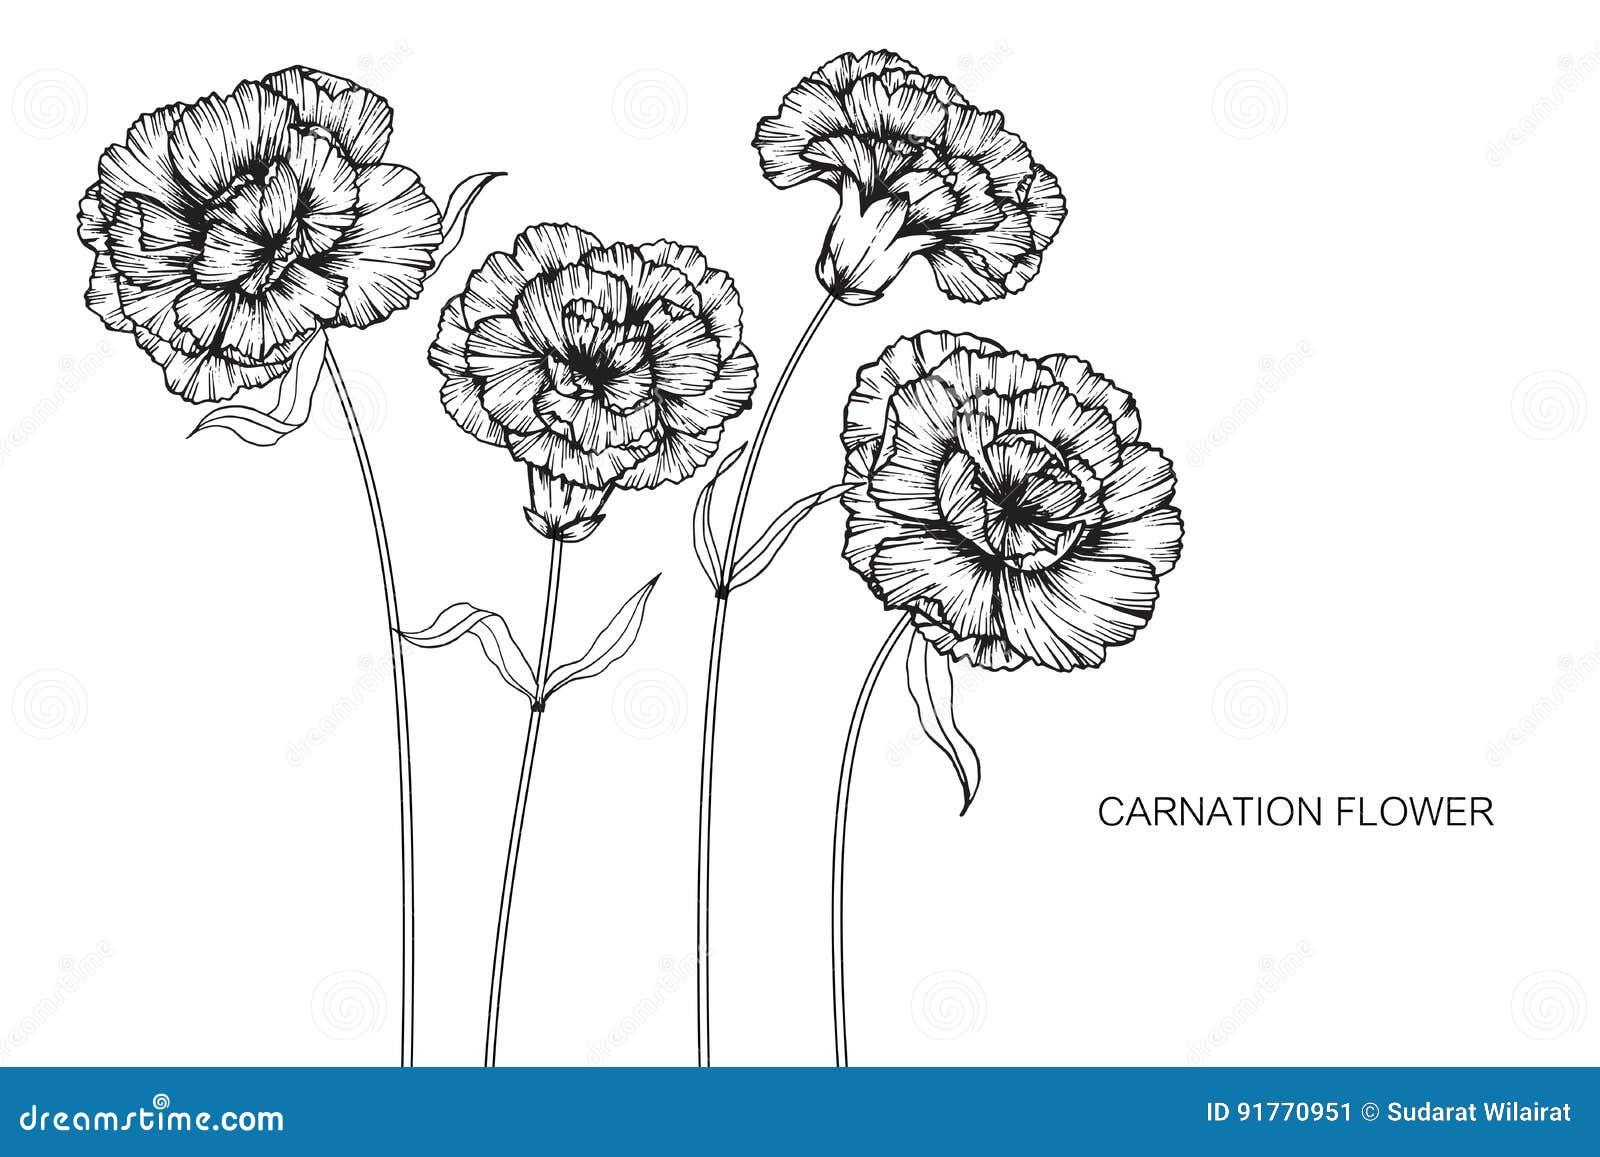 carnation diagram